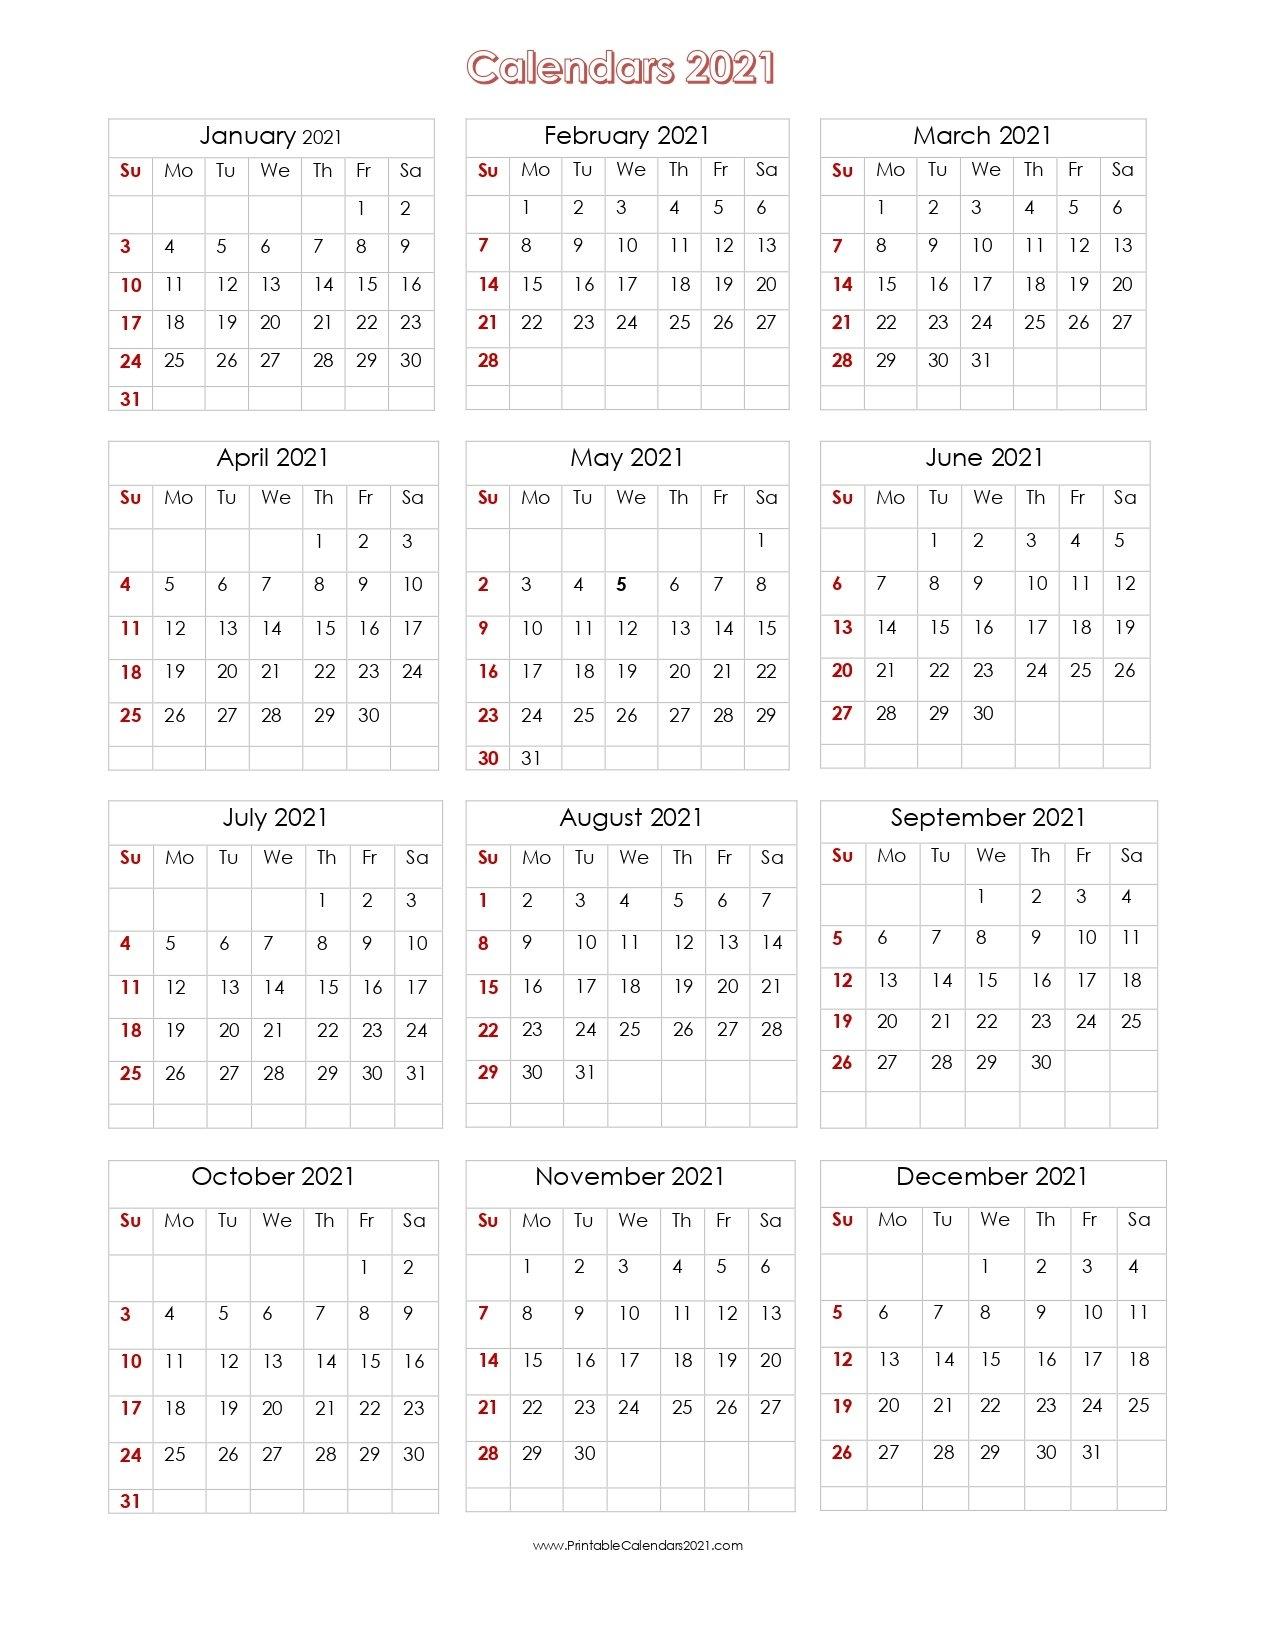 56+ Printable Calendar 2021 One Page, Printable 2021 Yearly Calendar regarding One Page Photo Calendar 2021 Image